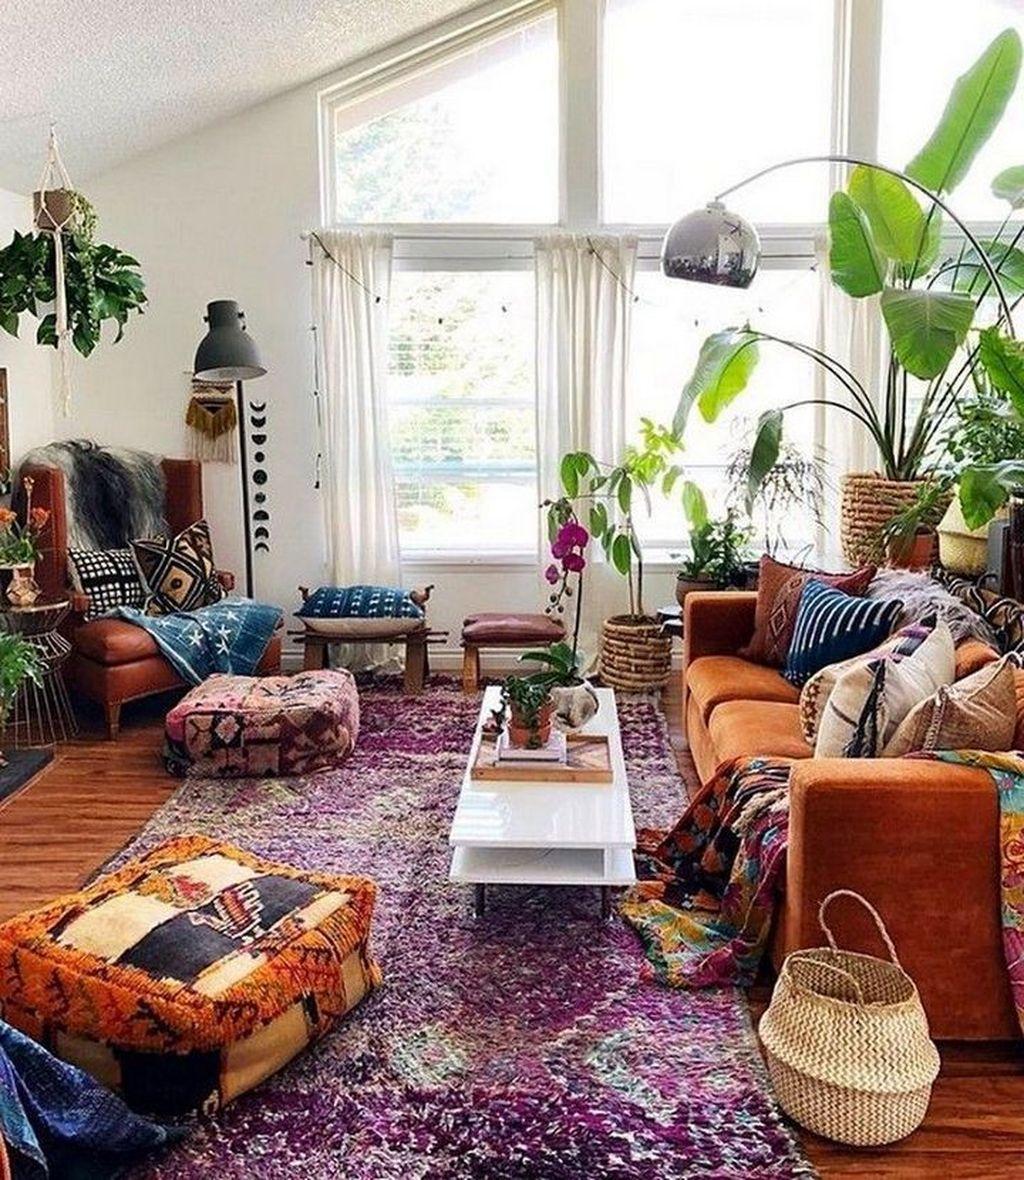 16 Awesome Bohemian Home Decor Ideas  Decoration interieur maison